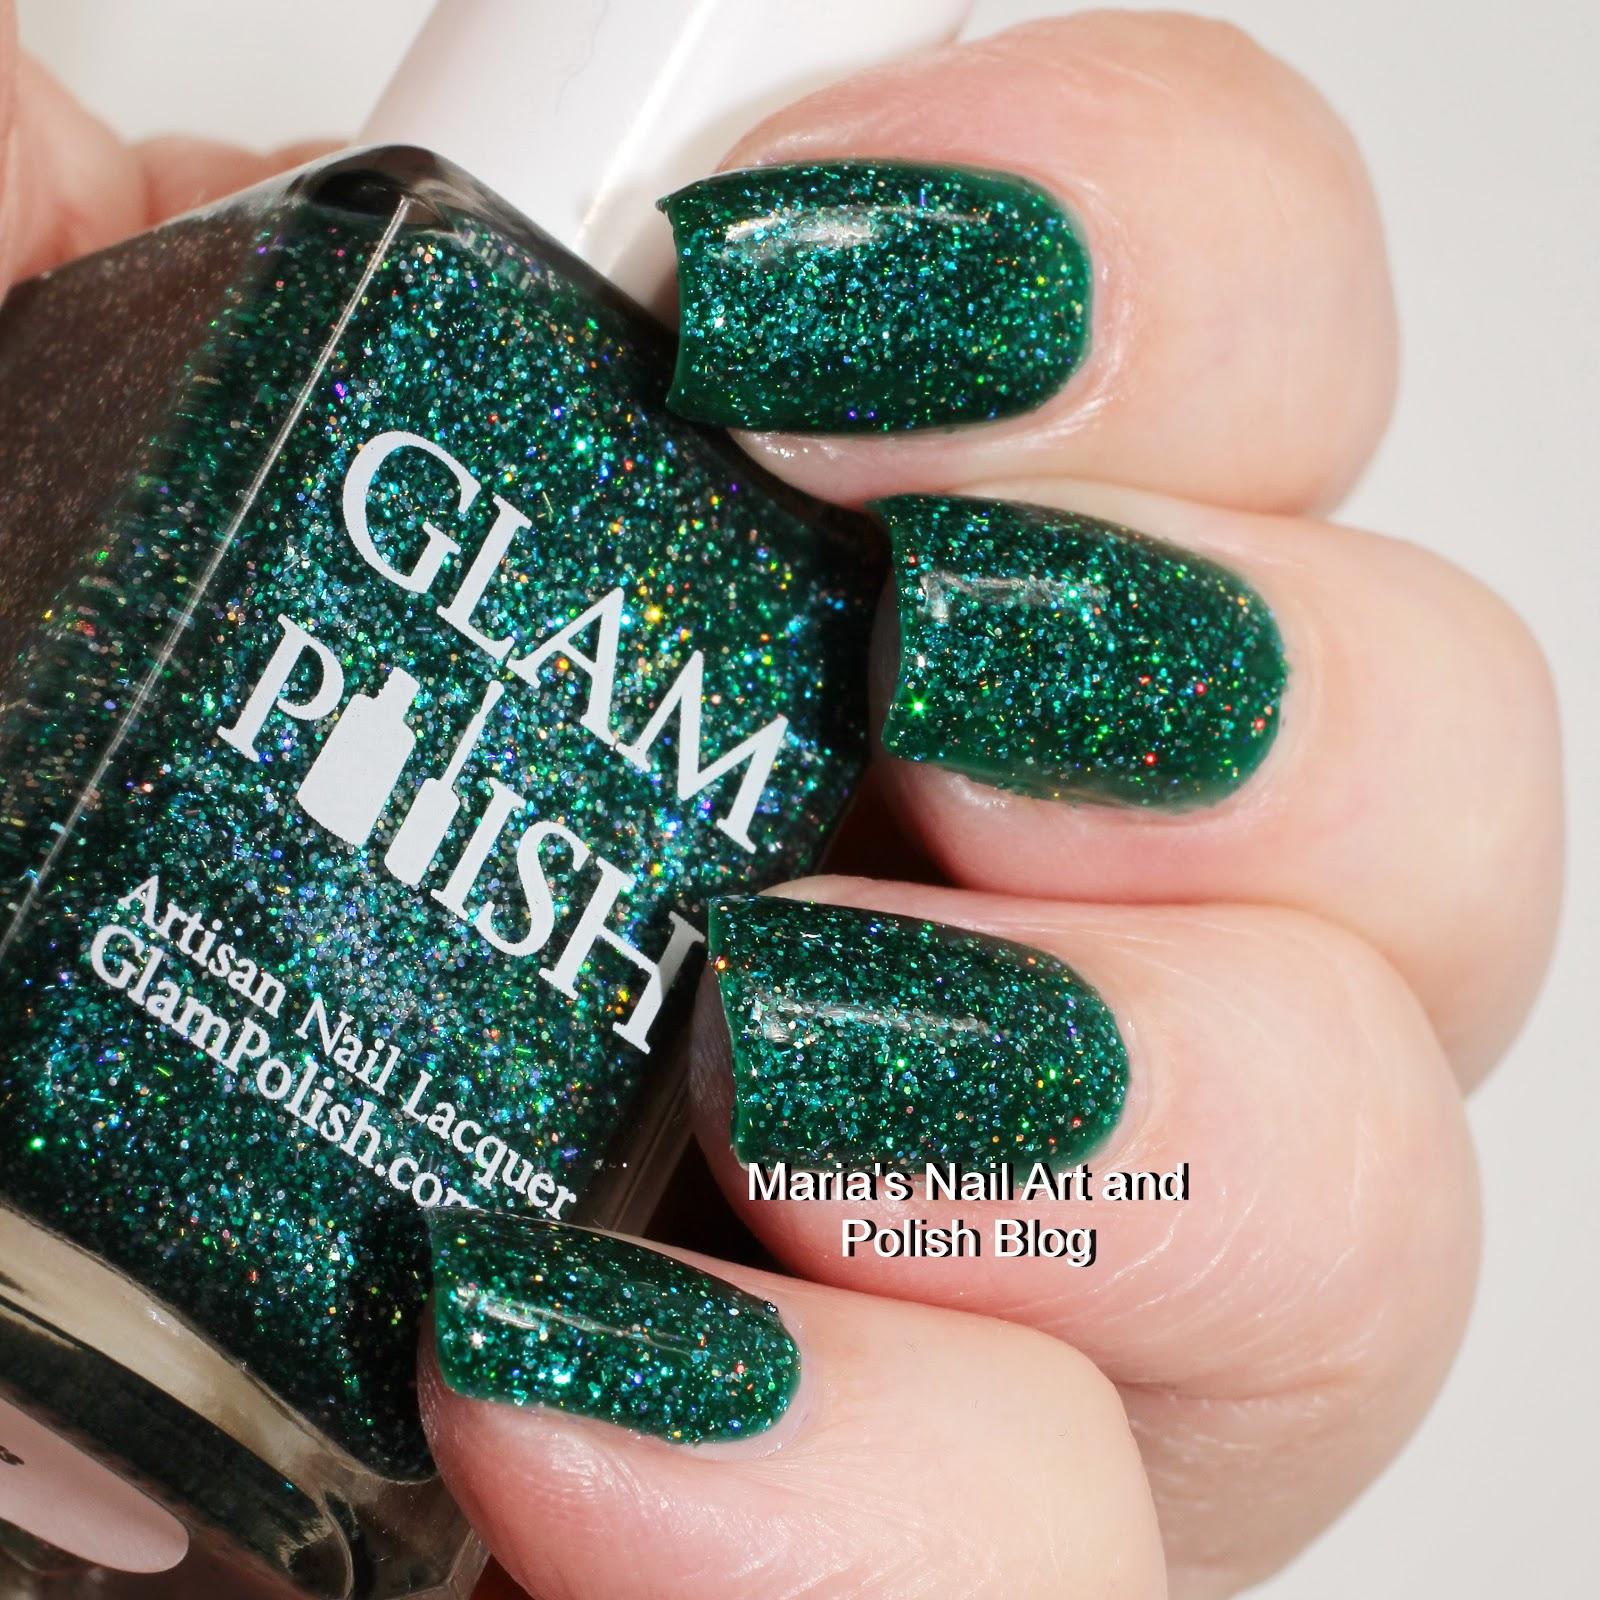 Marias Nail Art And Polish Blog Flushed With Stripes And: Marias Nail Art And Polish Blog: Glam Polish Taurus